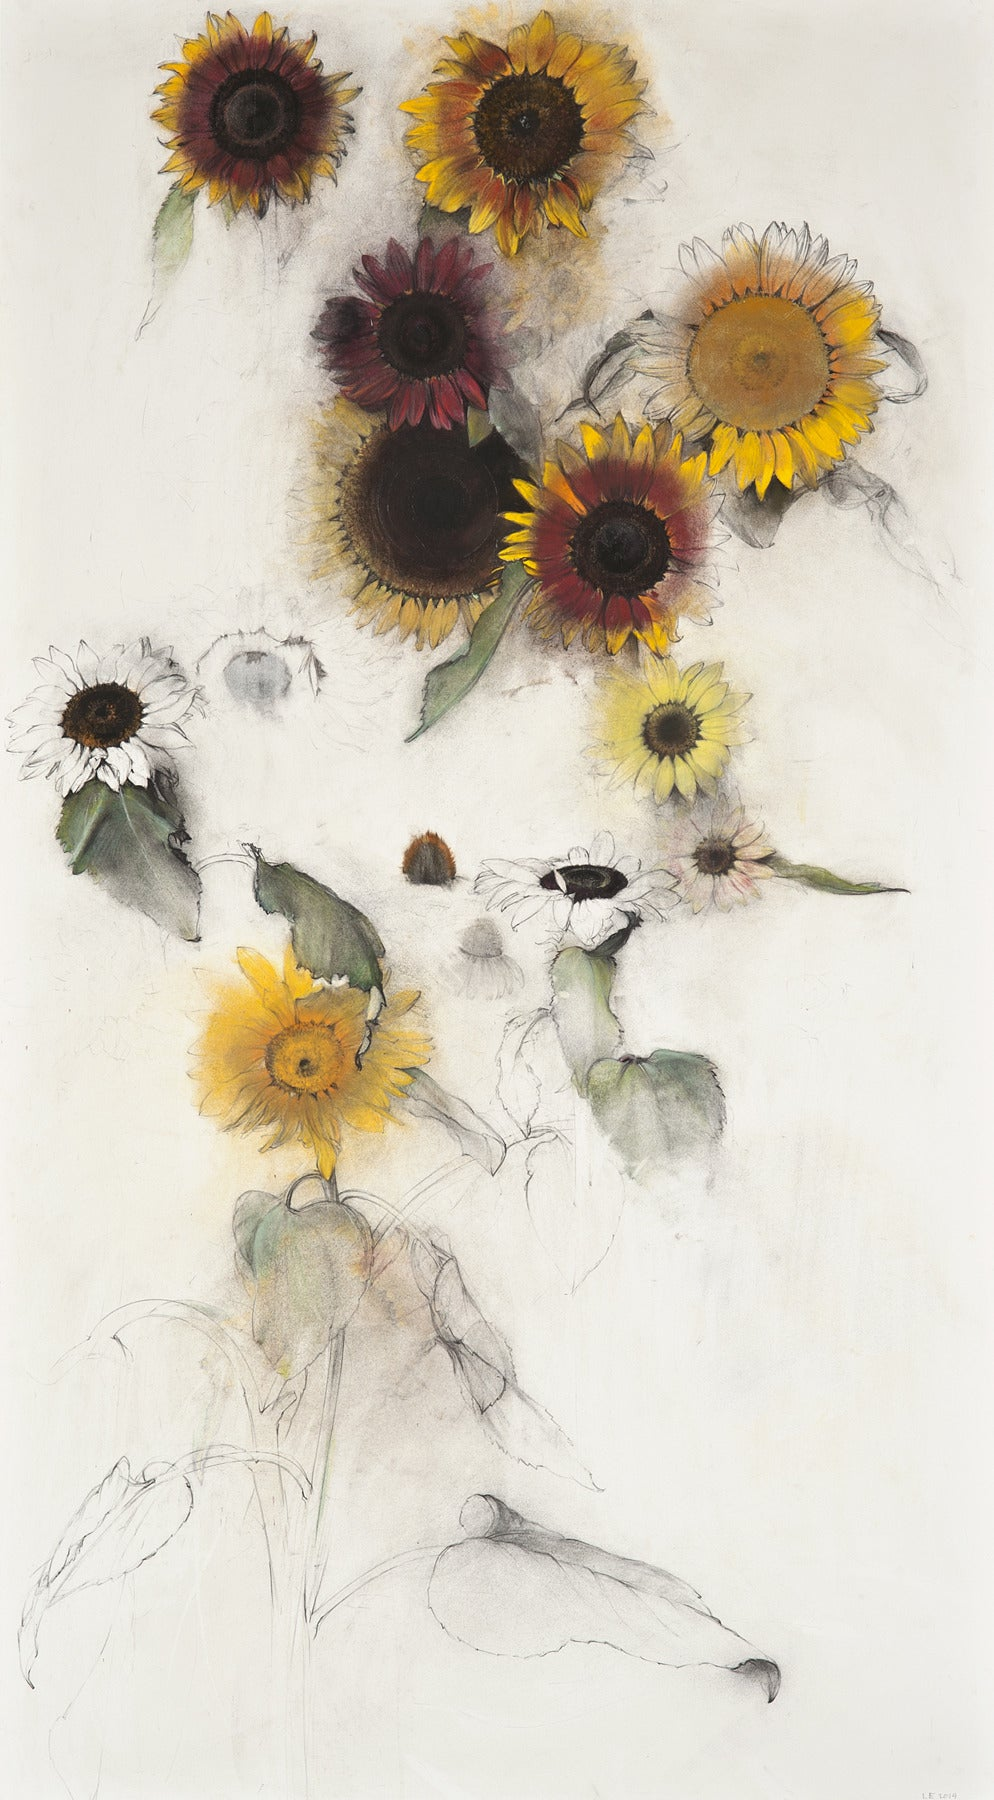 Pat's Sunflowers